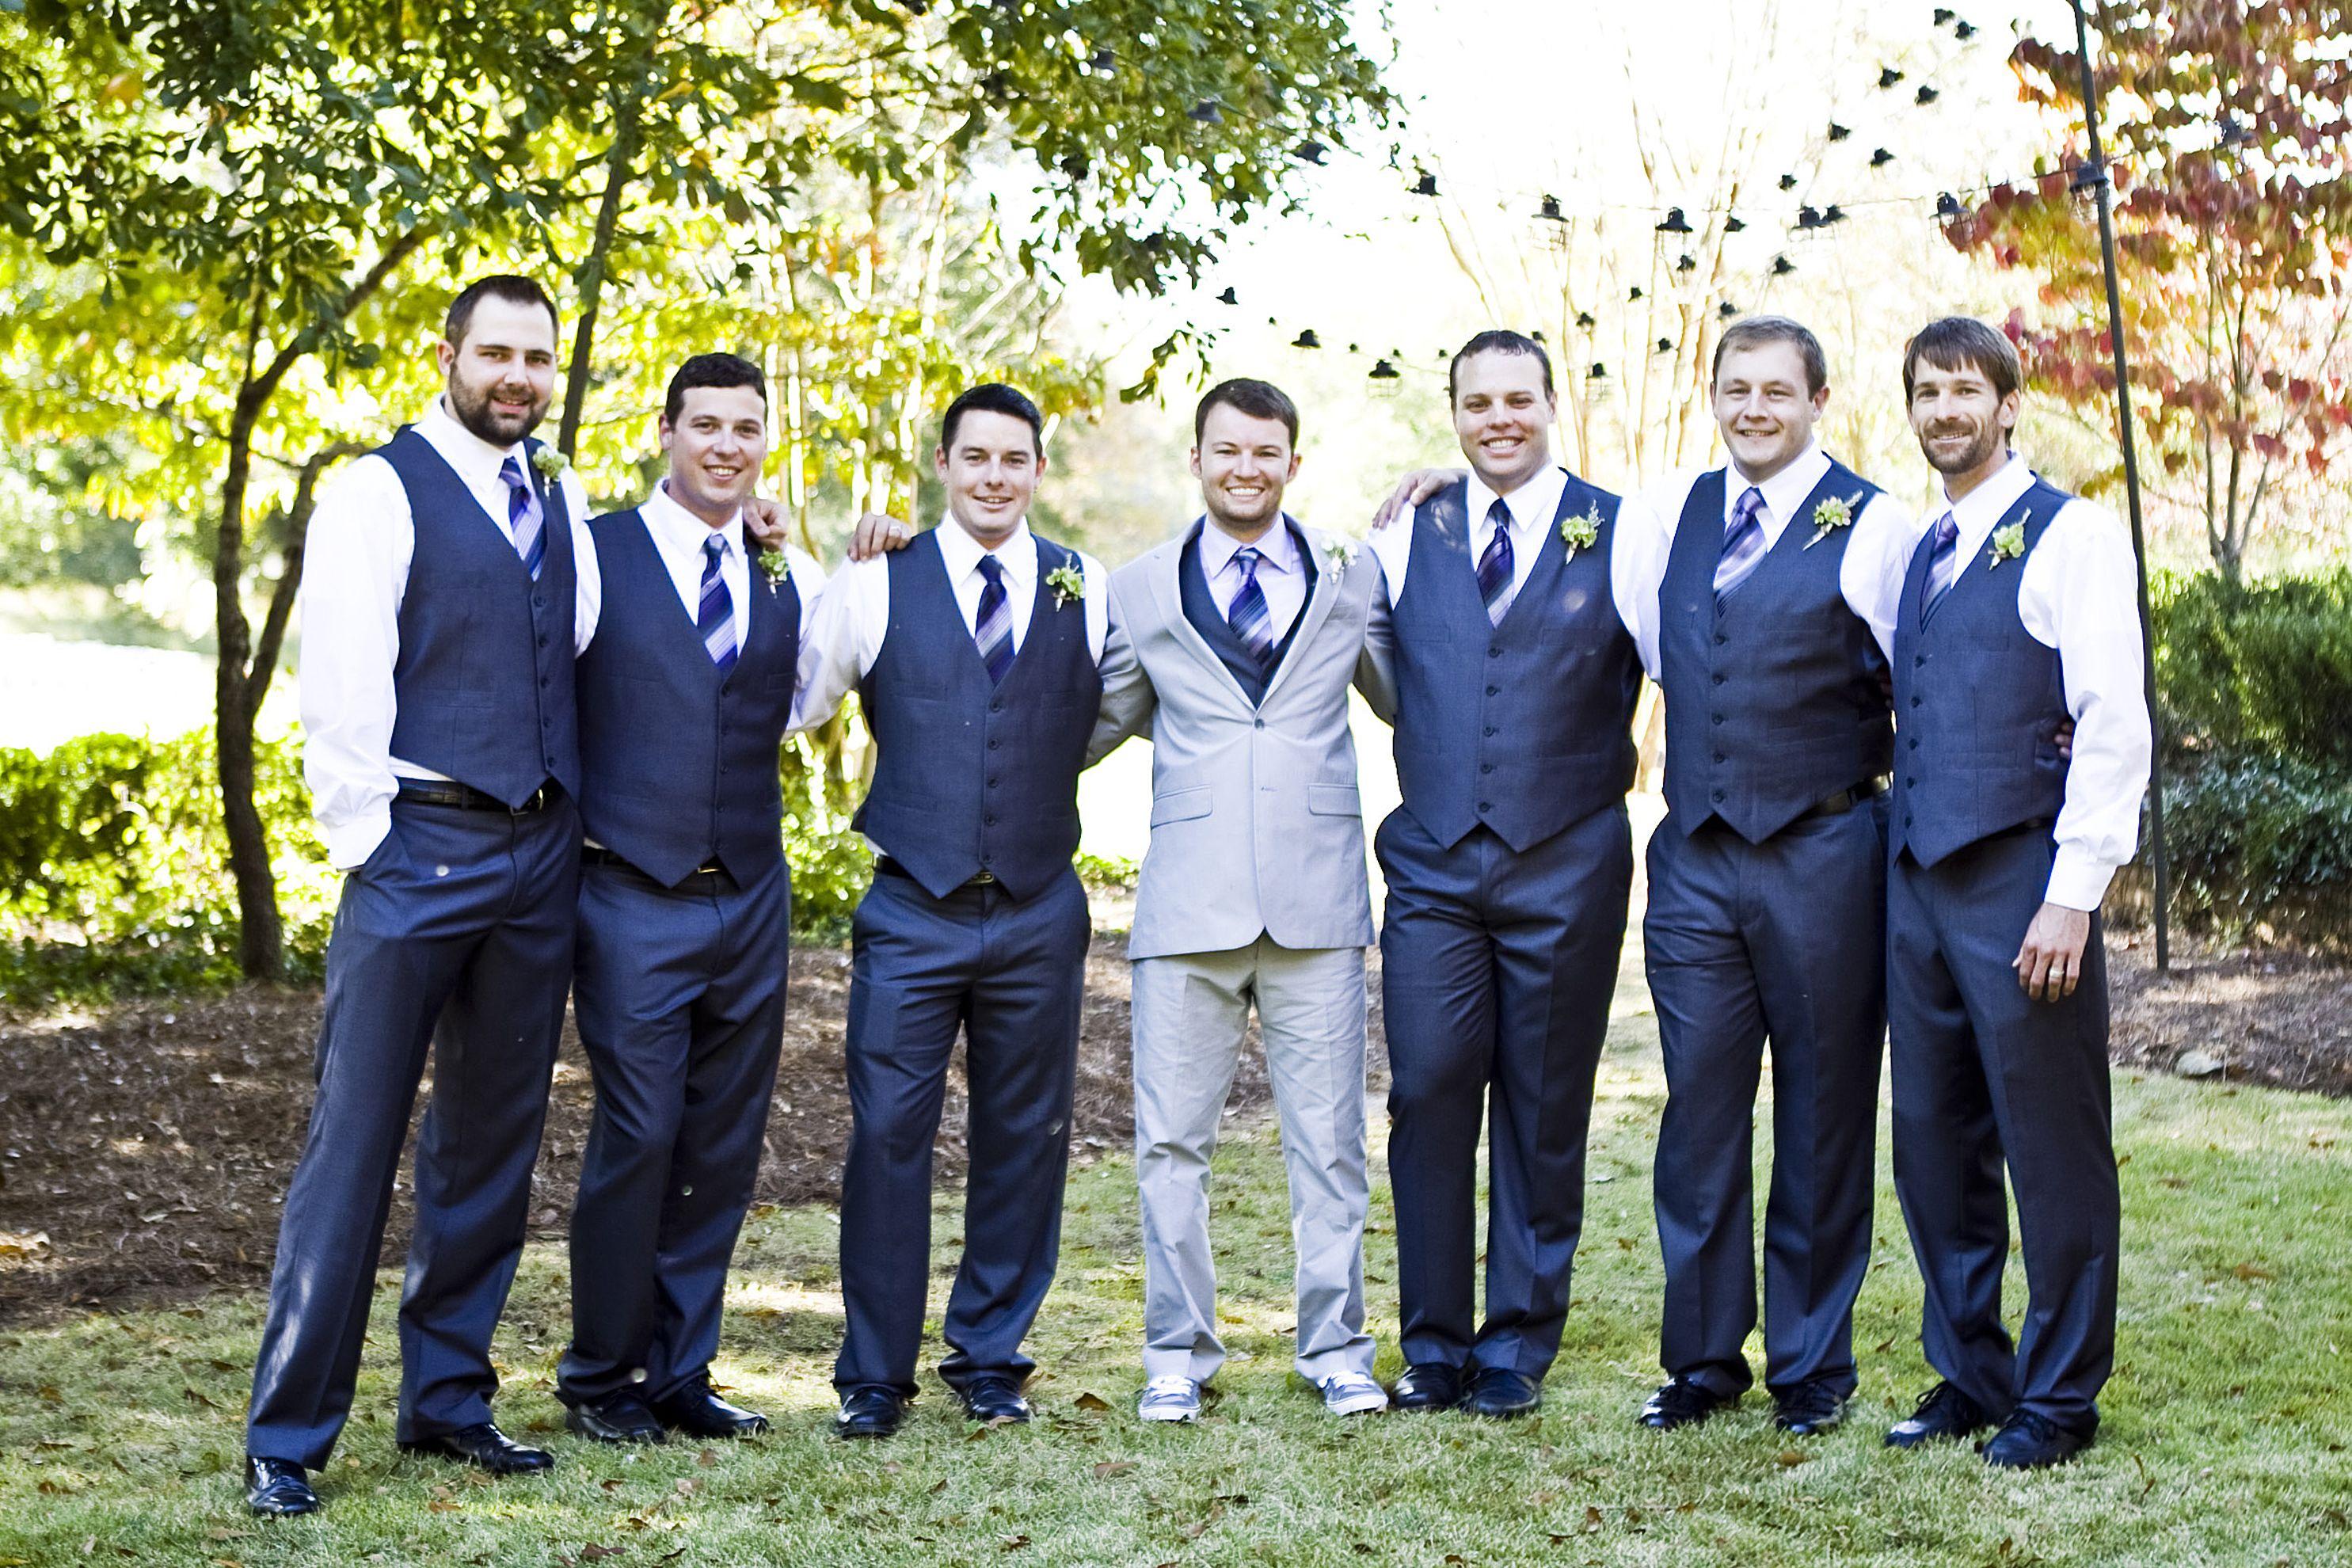 Wedding Suit Ideas For Groomsmen : Groomsmen- Gray Suits Wedding Ideas Pinterest